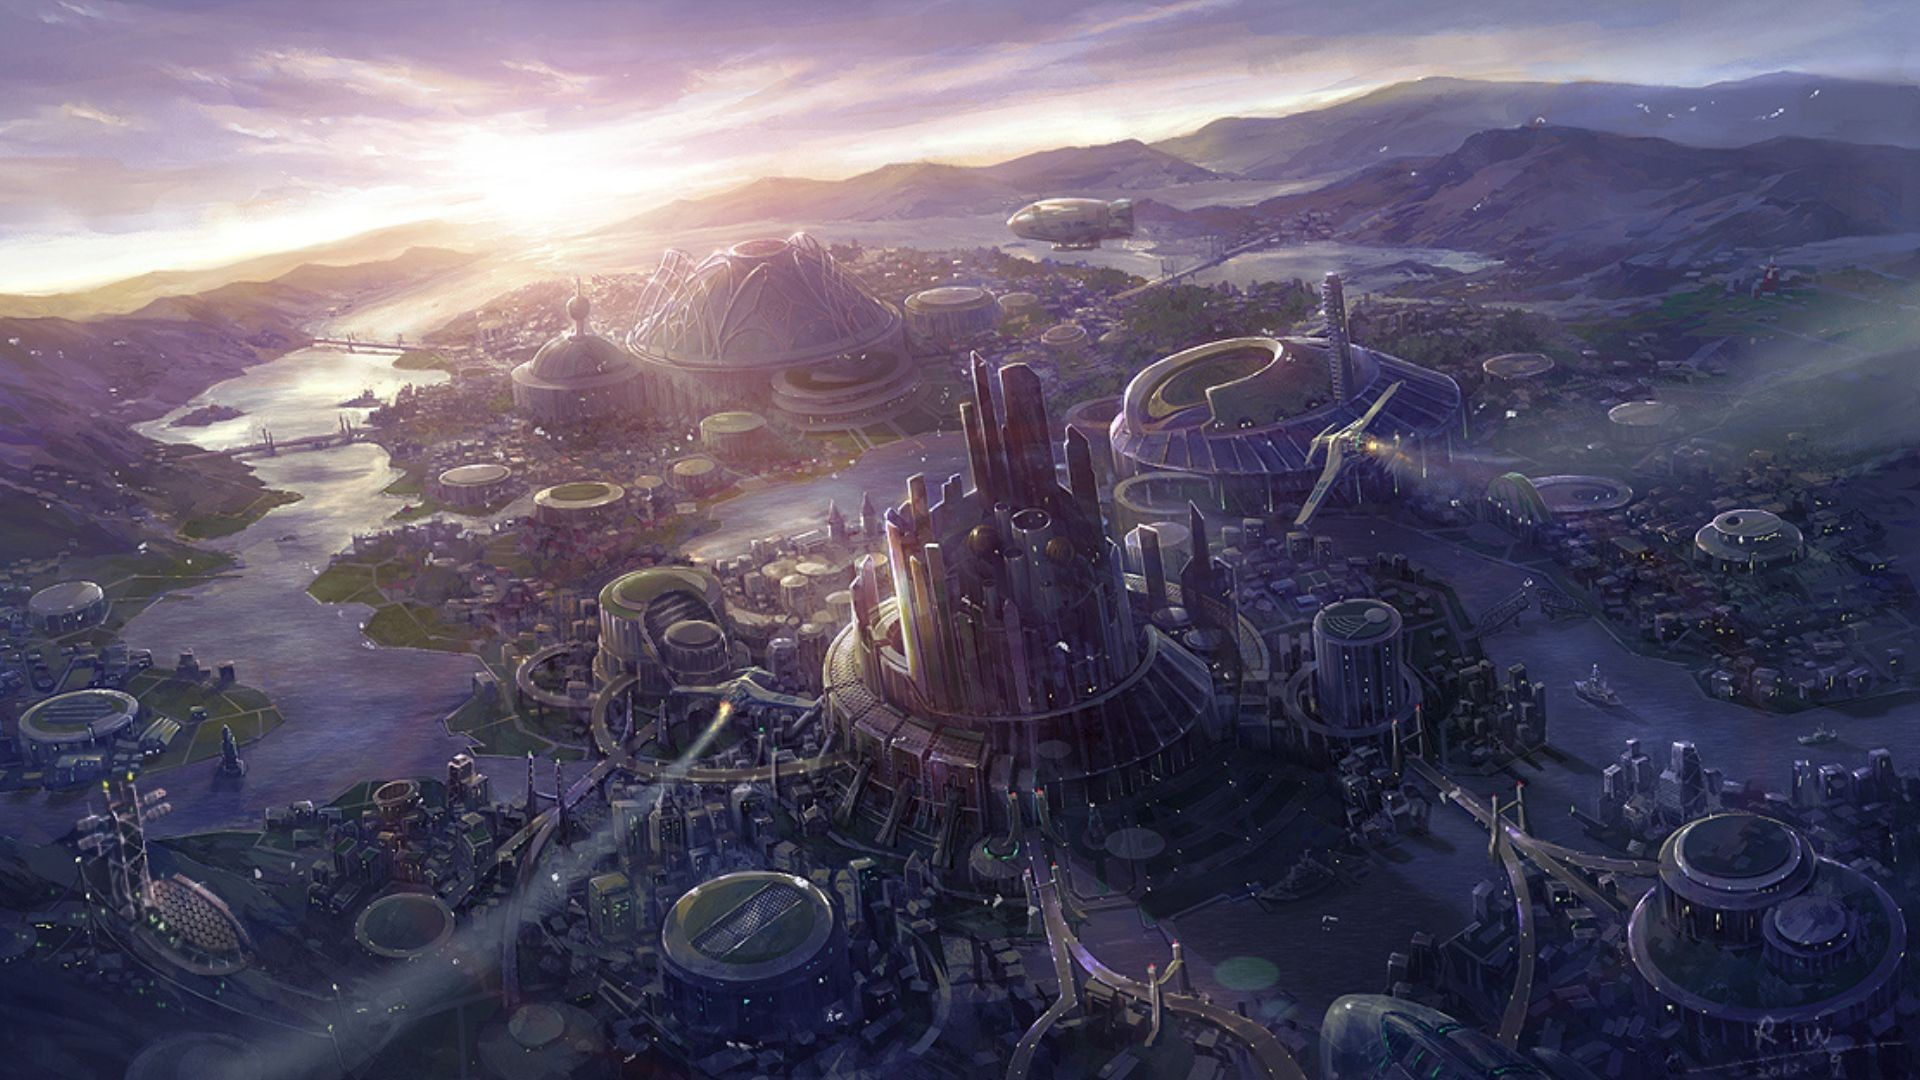 sci fi fantasy landscape   Sci Fi Landscape Wallpaper/Background 1920 x  1080 – Id